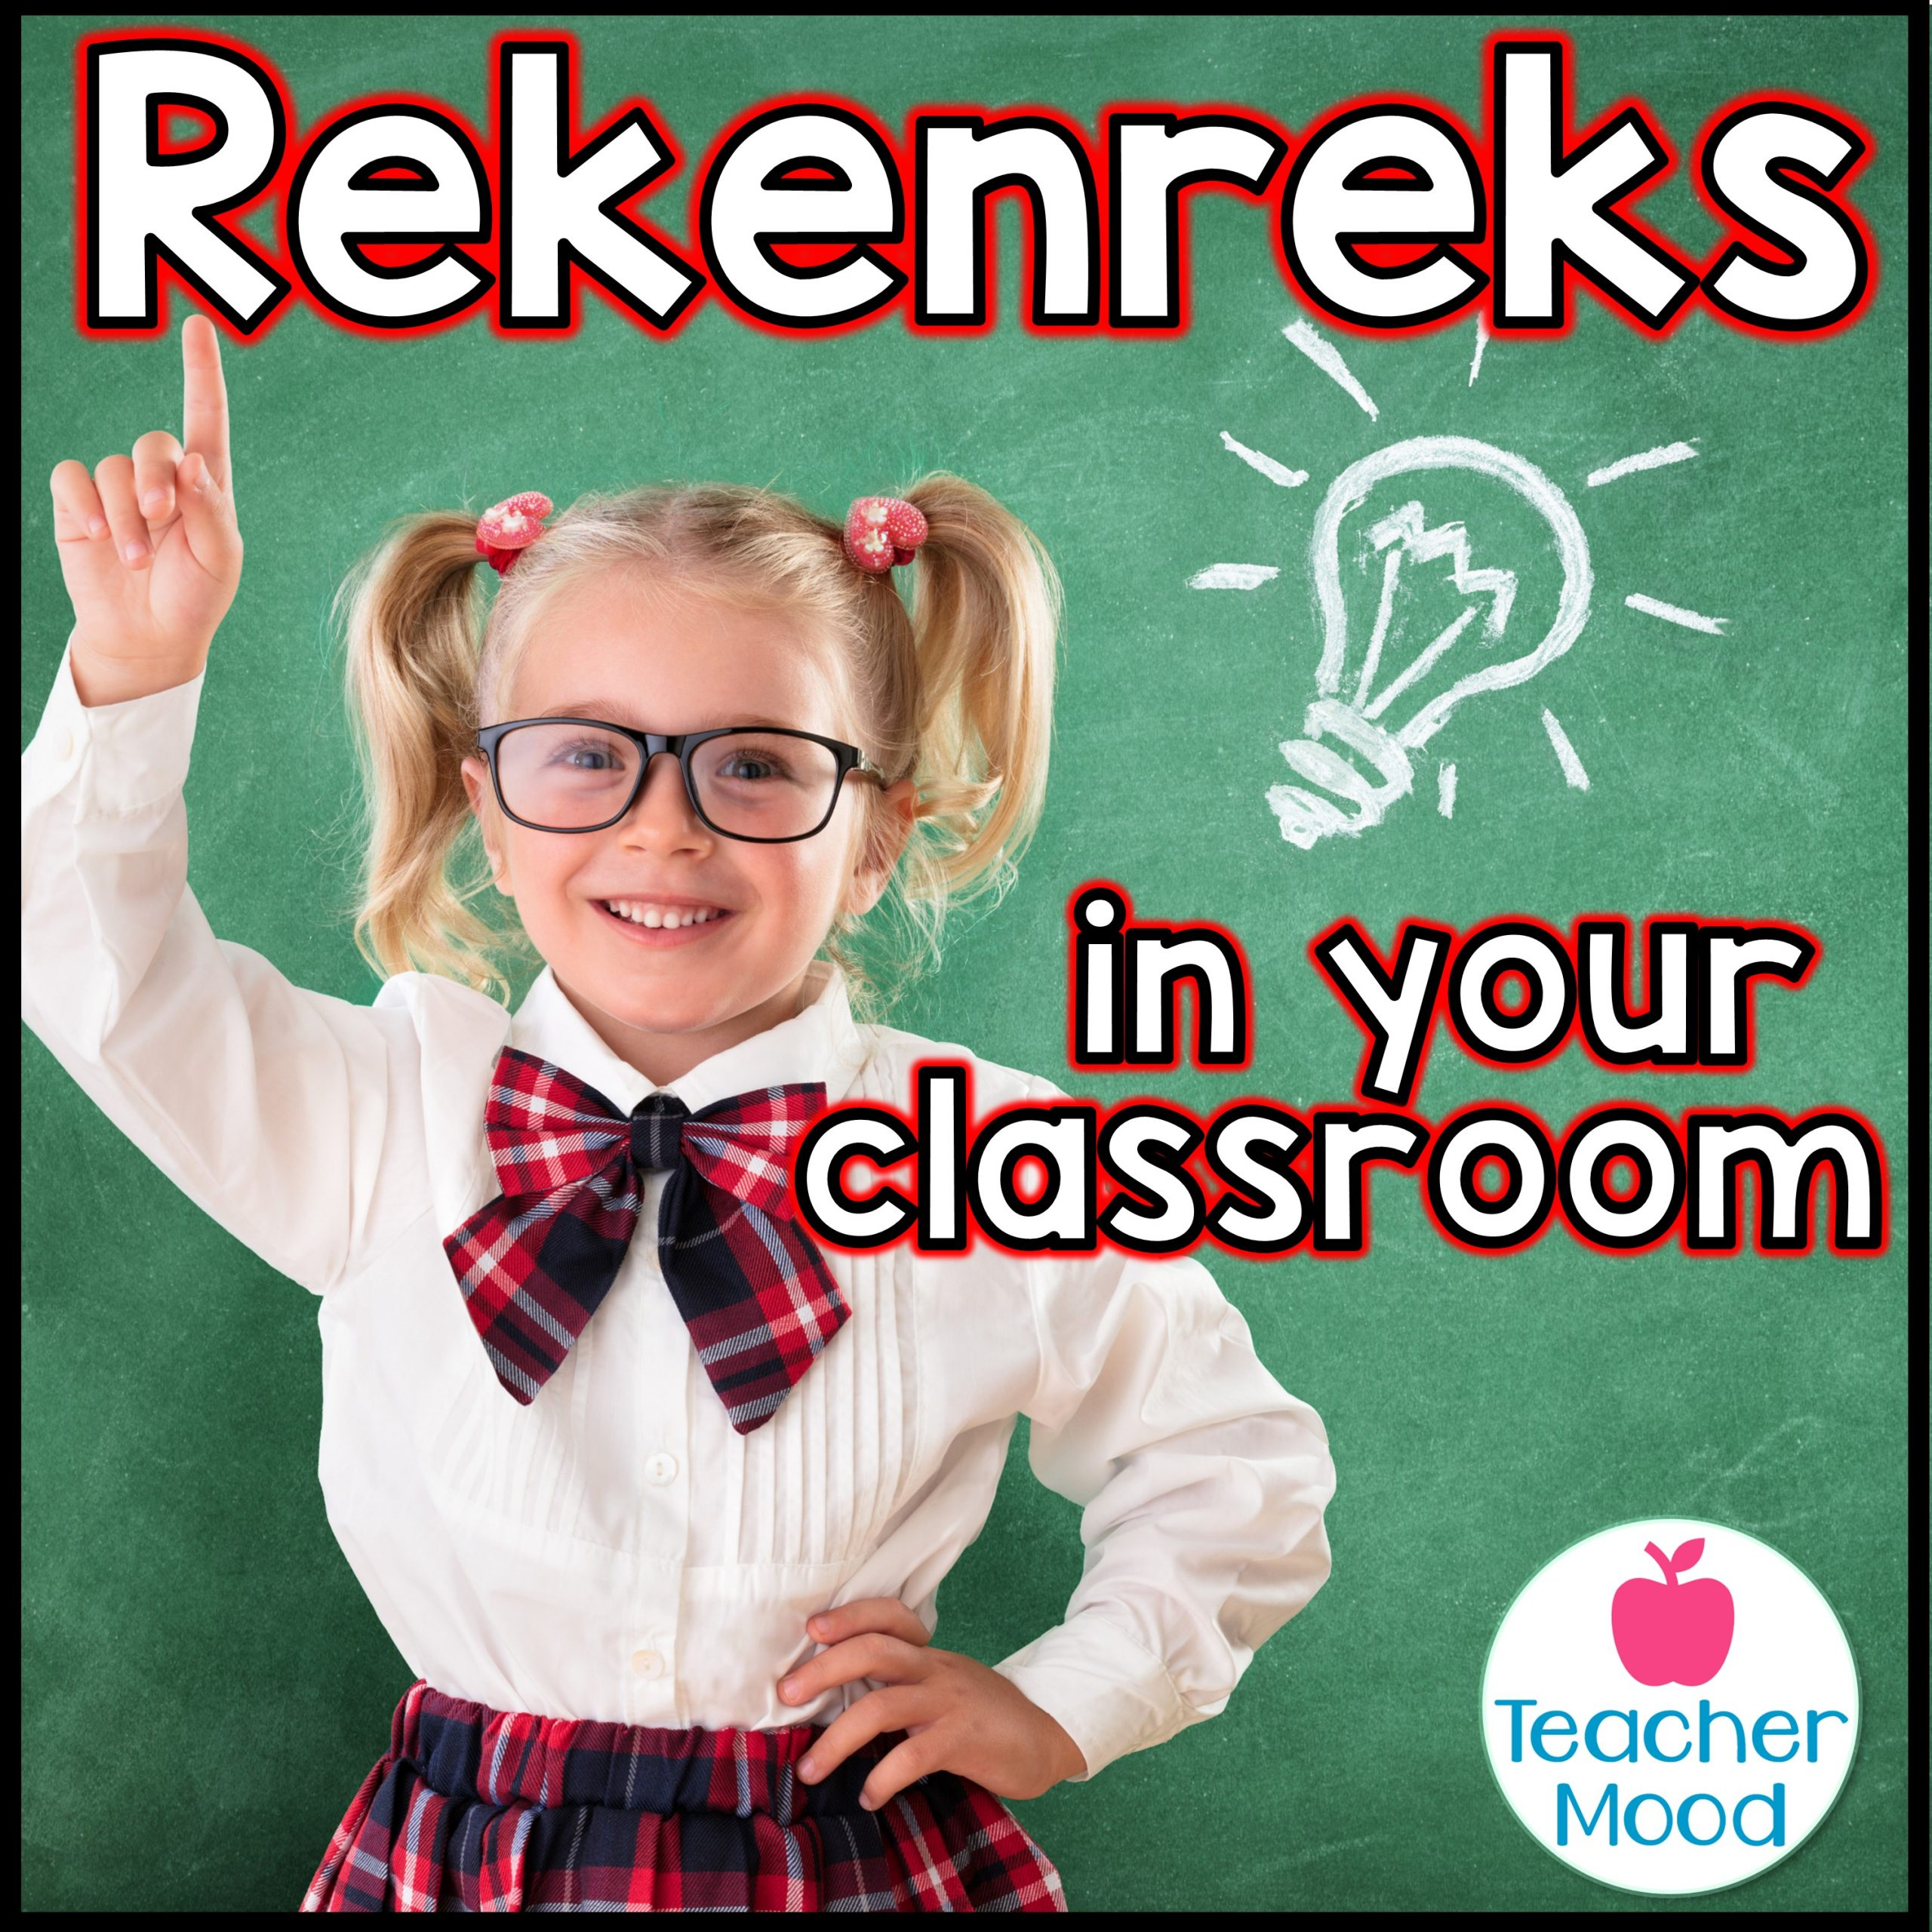 ideas for using rekenreks